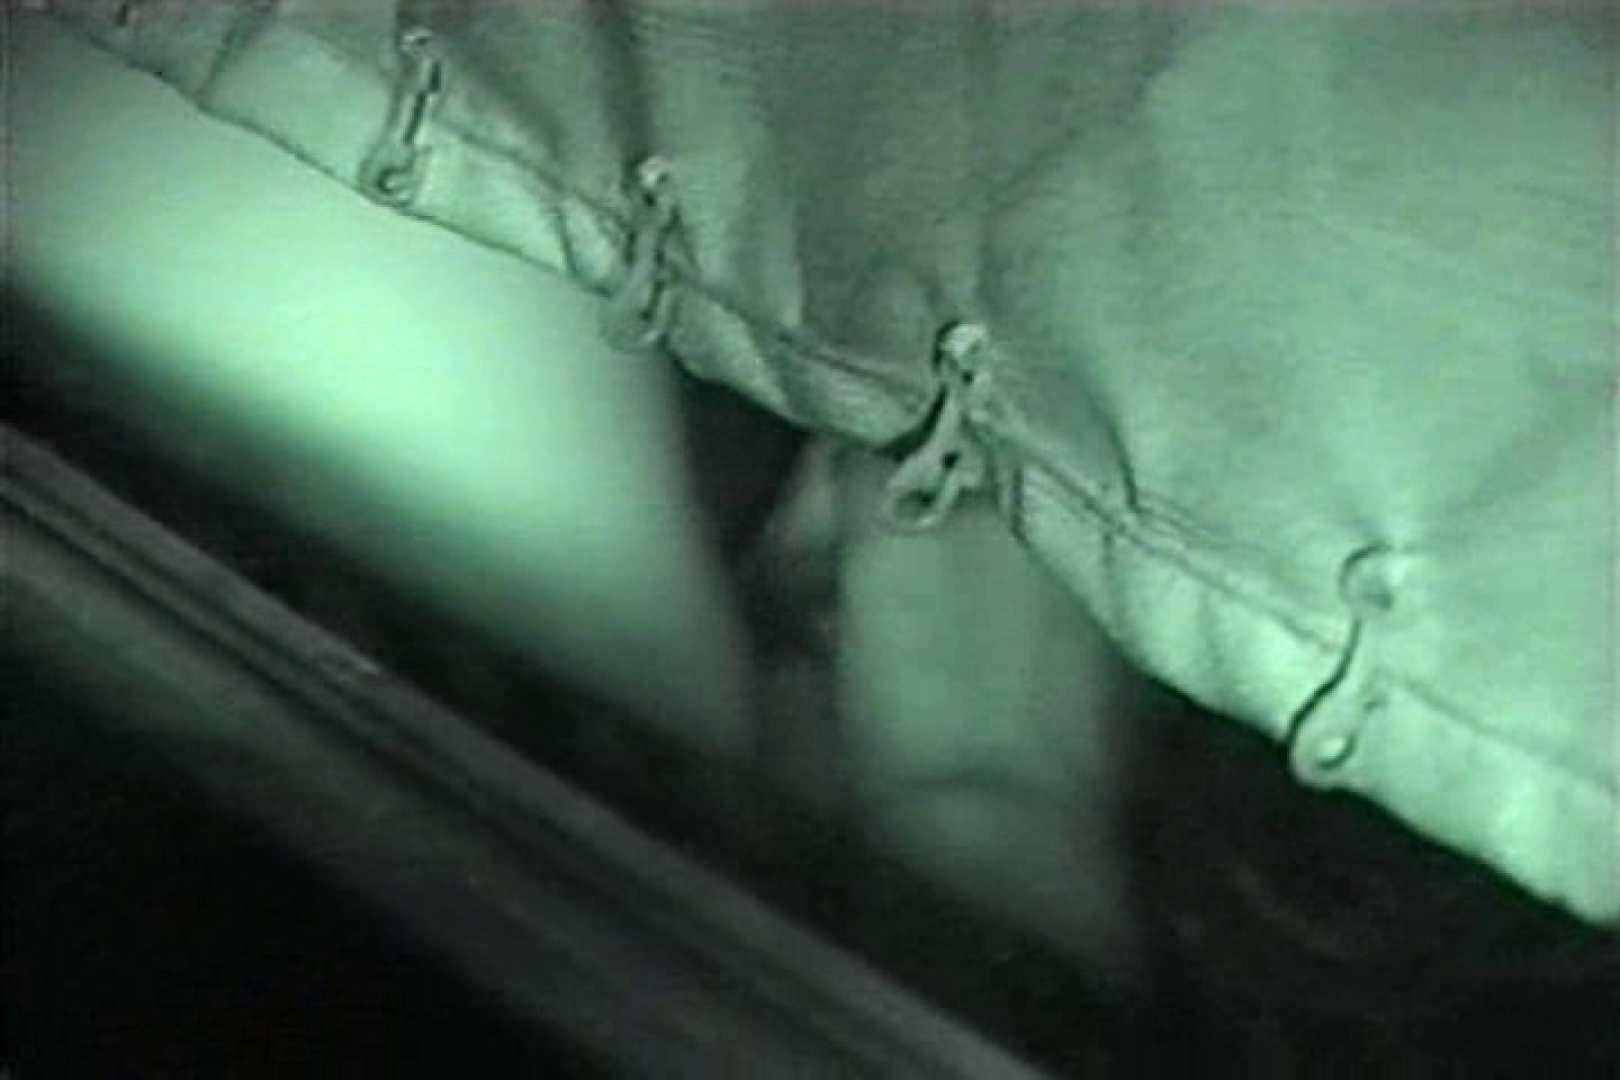 MASAさんの待ち伏せ撮り! 赤外線カーセックスVol.7 マンコ 隠し撮りオマンコ動画紹介 60pic 33